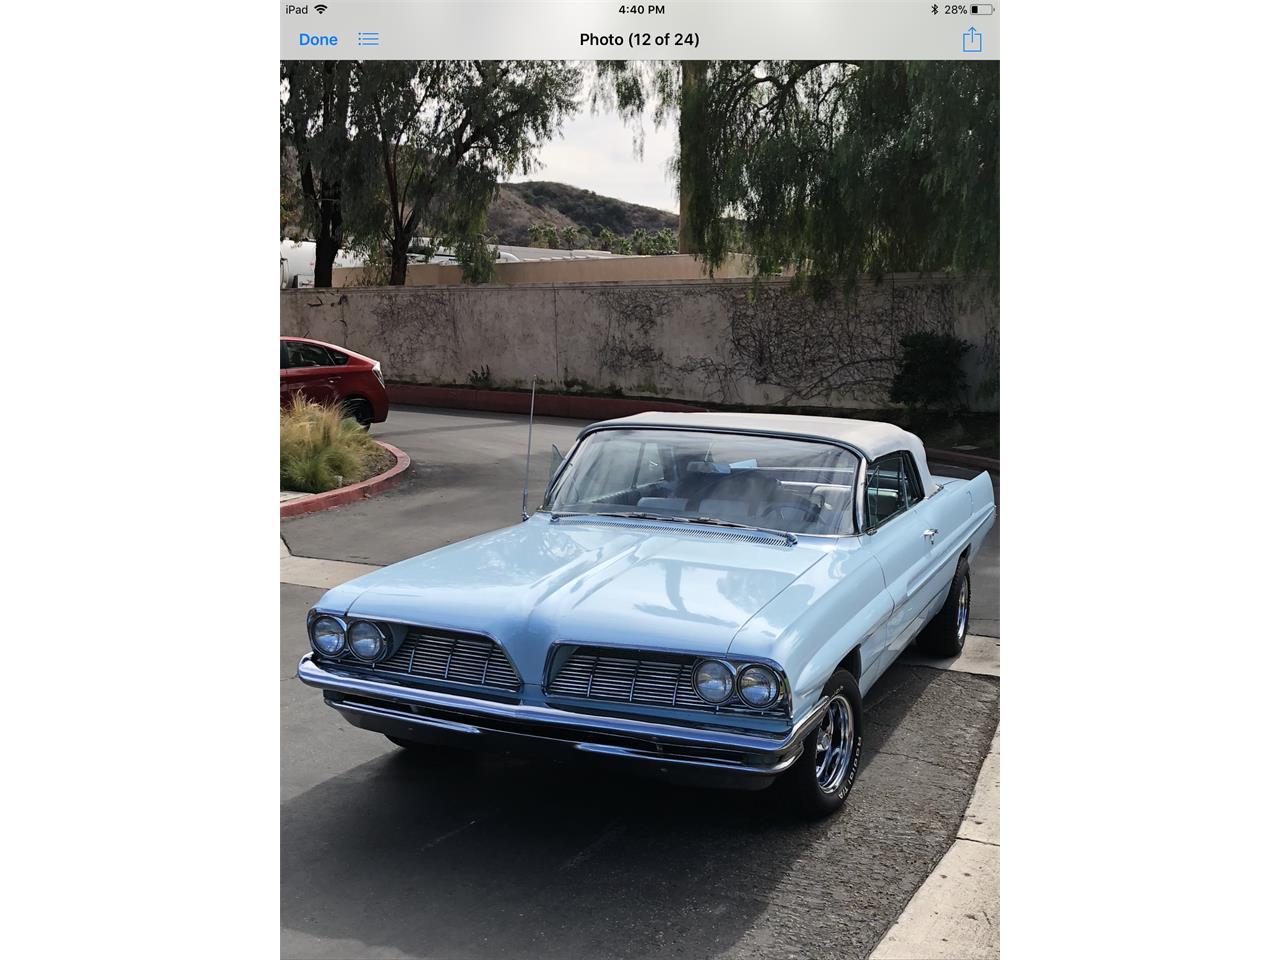 Large Picture of '61 Bonneville located in Cot de Caza California - ASQZ